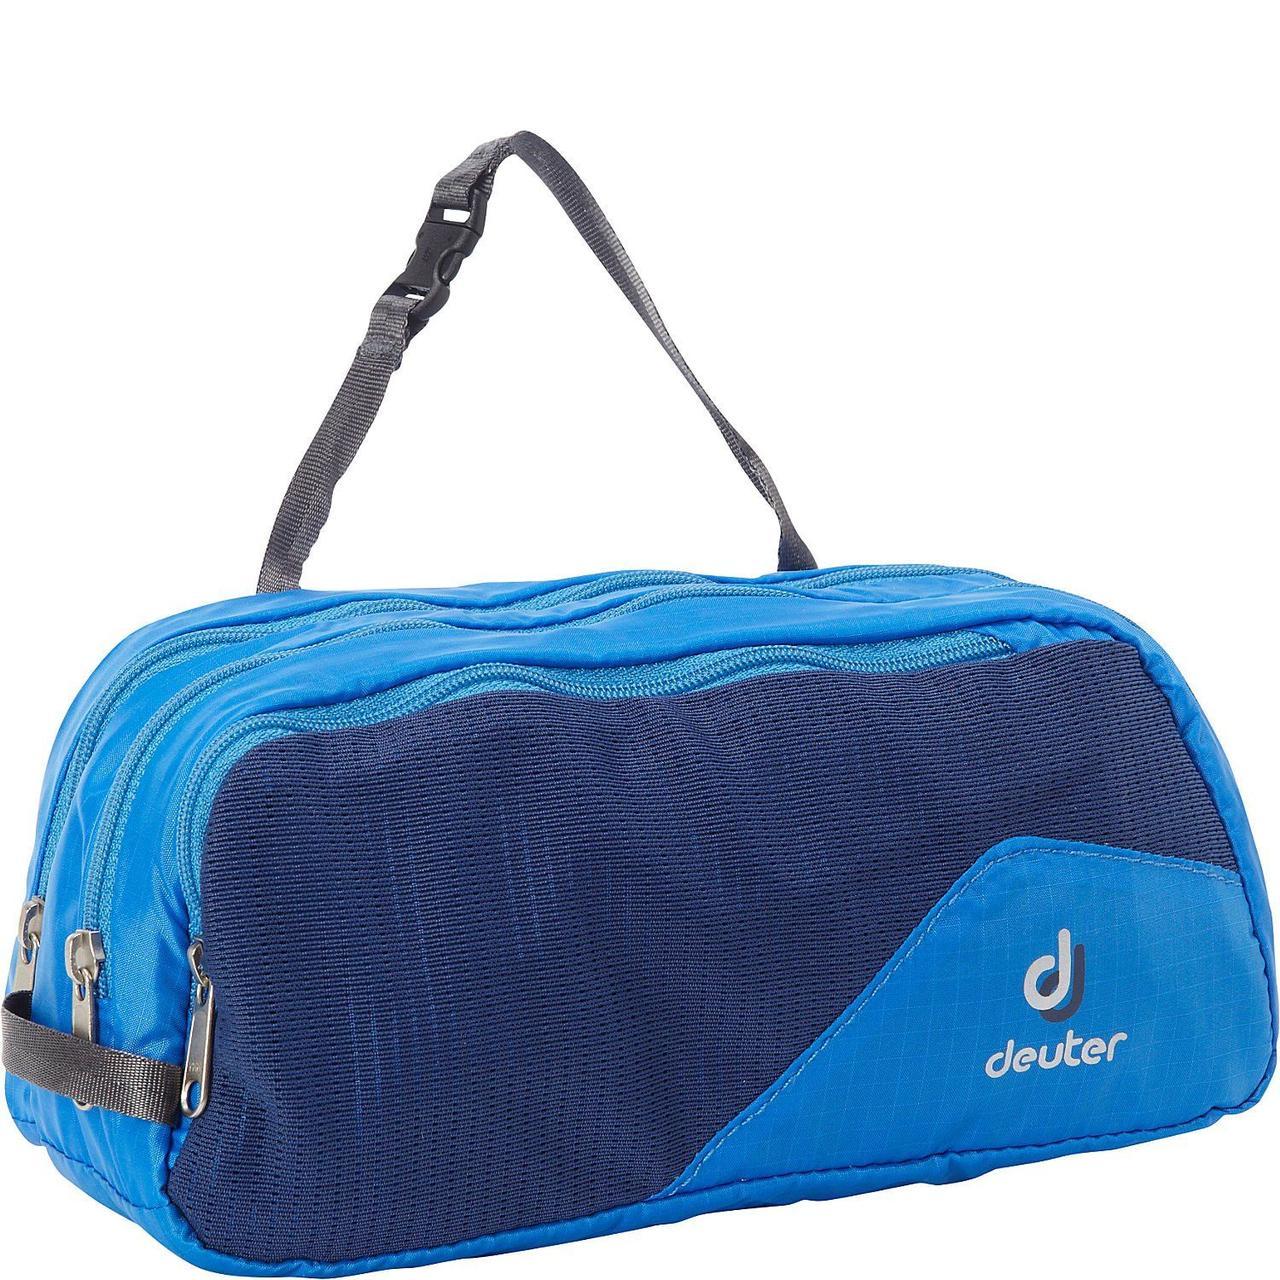 Несессер Deuter Wash Bag Tour III coolblue-midnight (39444 3333)